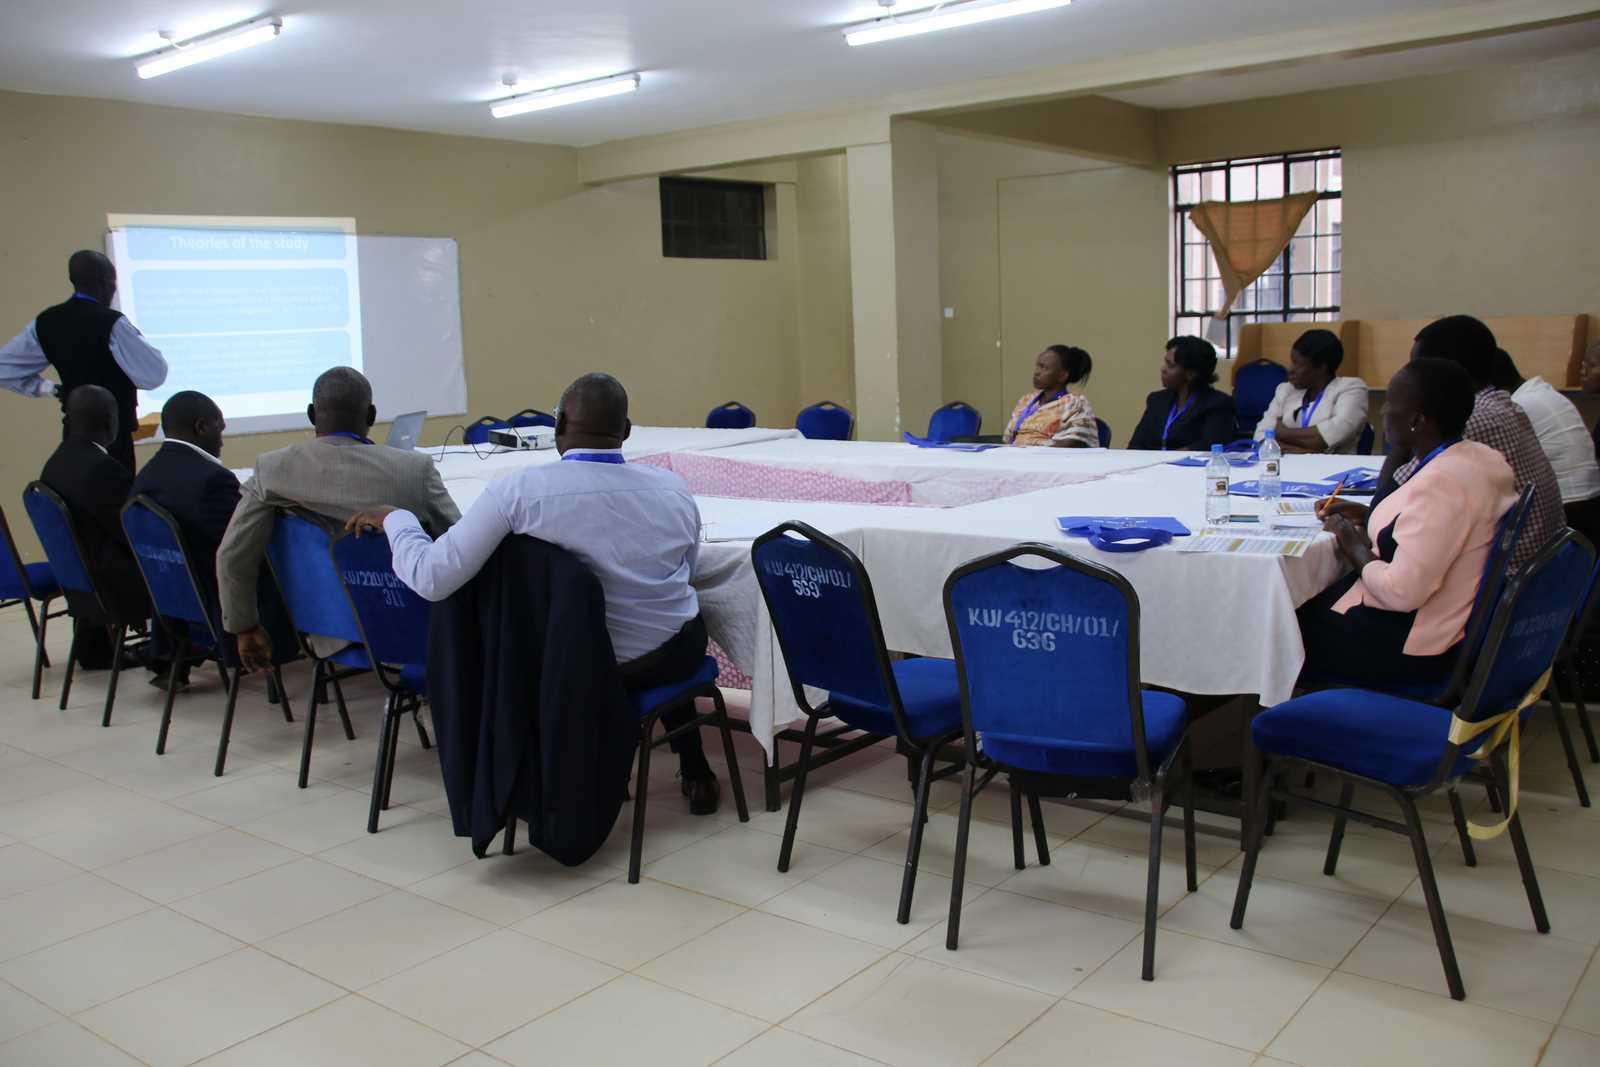 2nd Interdisciplinary International Scientific Conference Presentations